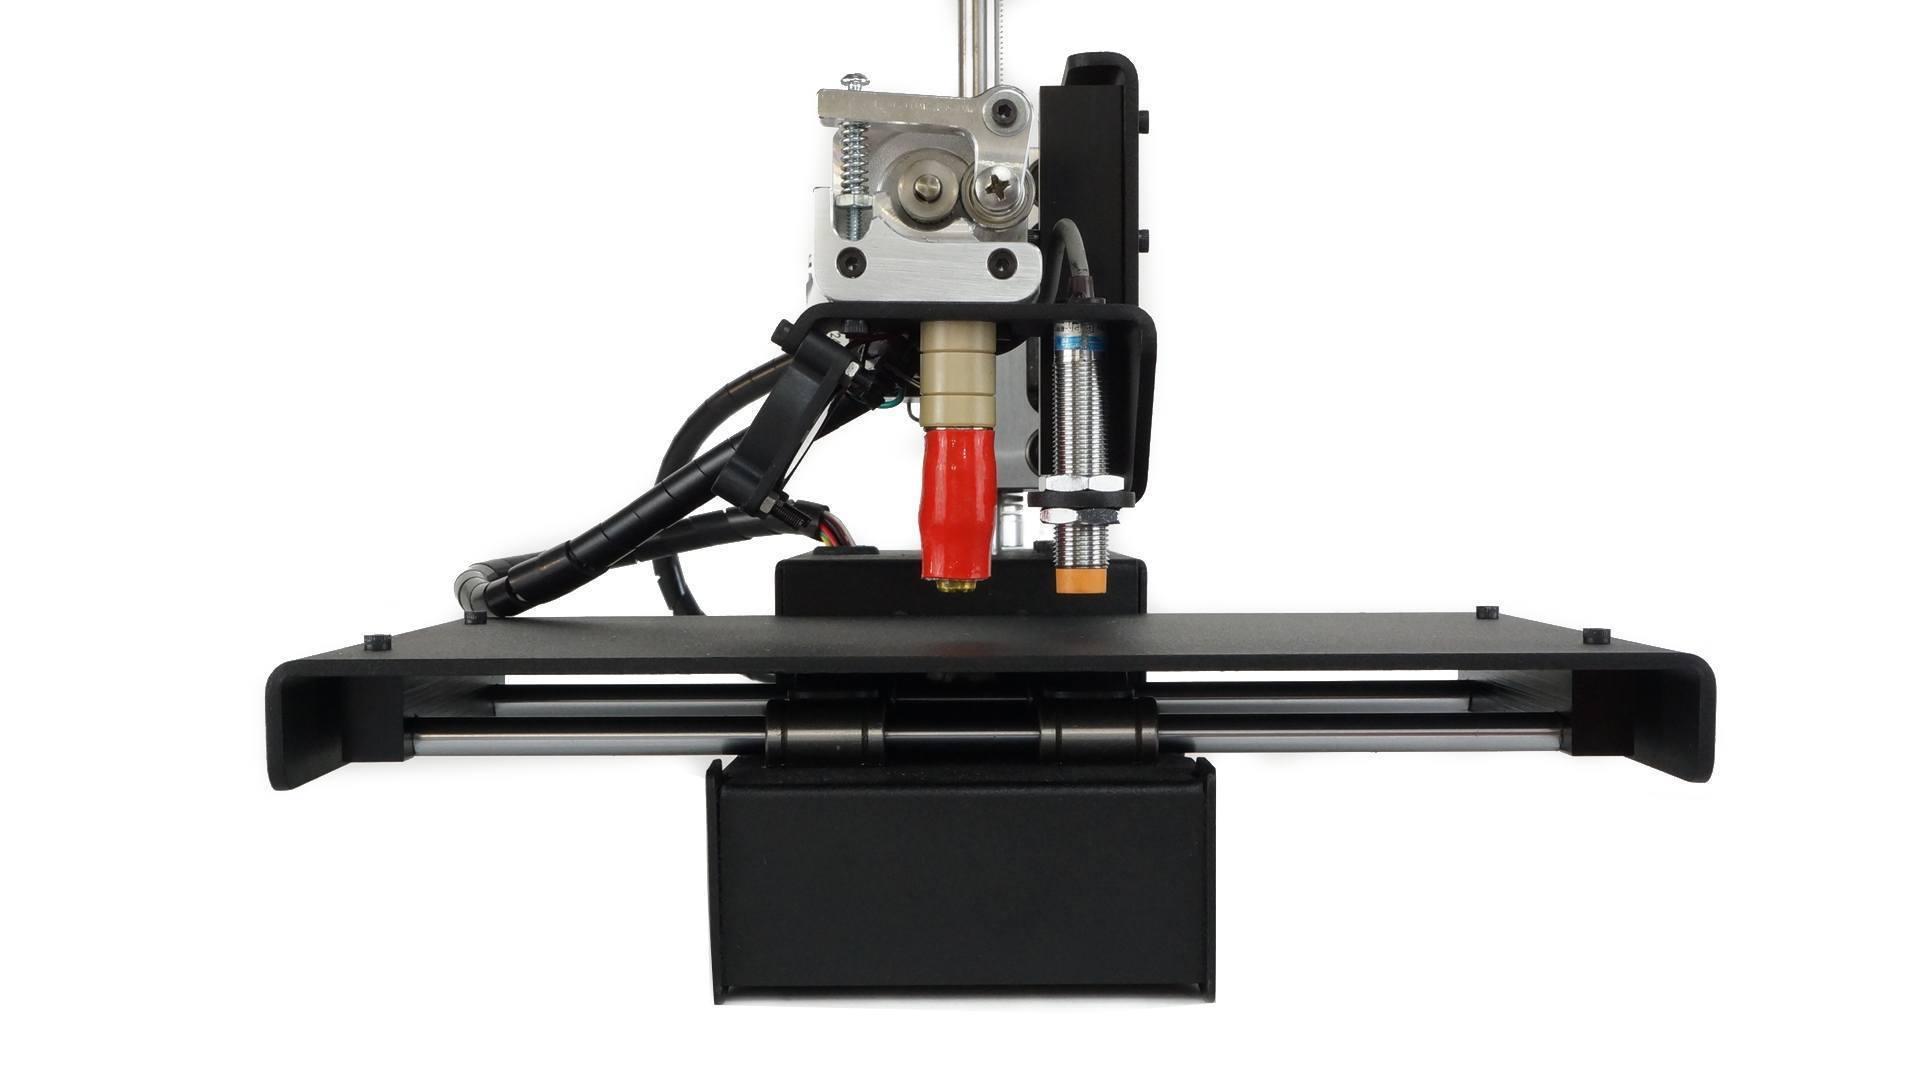 printrbot simple metal kit 3d printer reviews specs pinshape